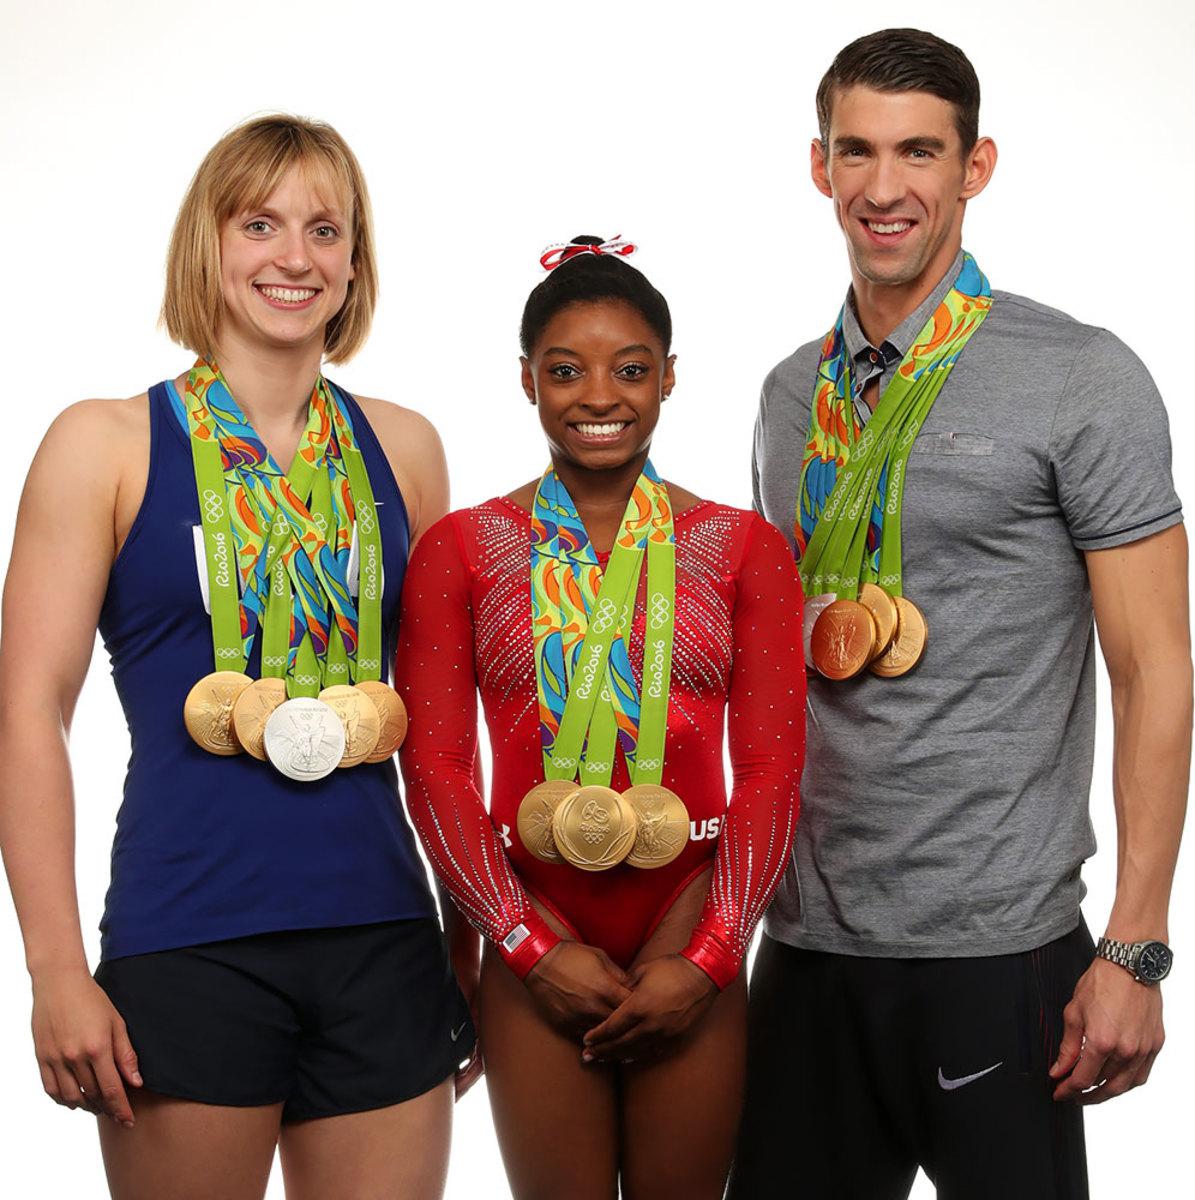 2016-0814-Katie-Ledecky-Simone-Biles-Michael-Phelps-SI51_TK3_00296.jpg